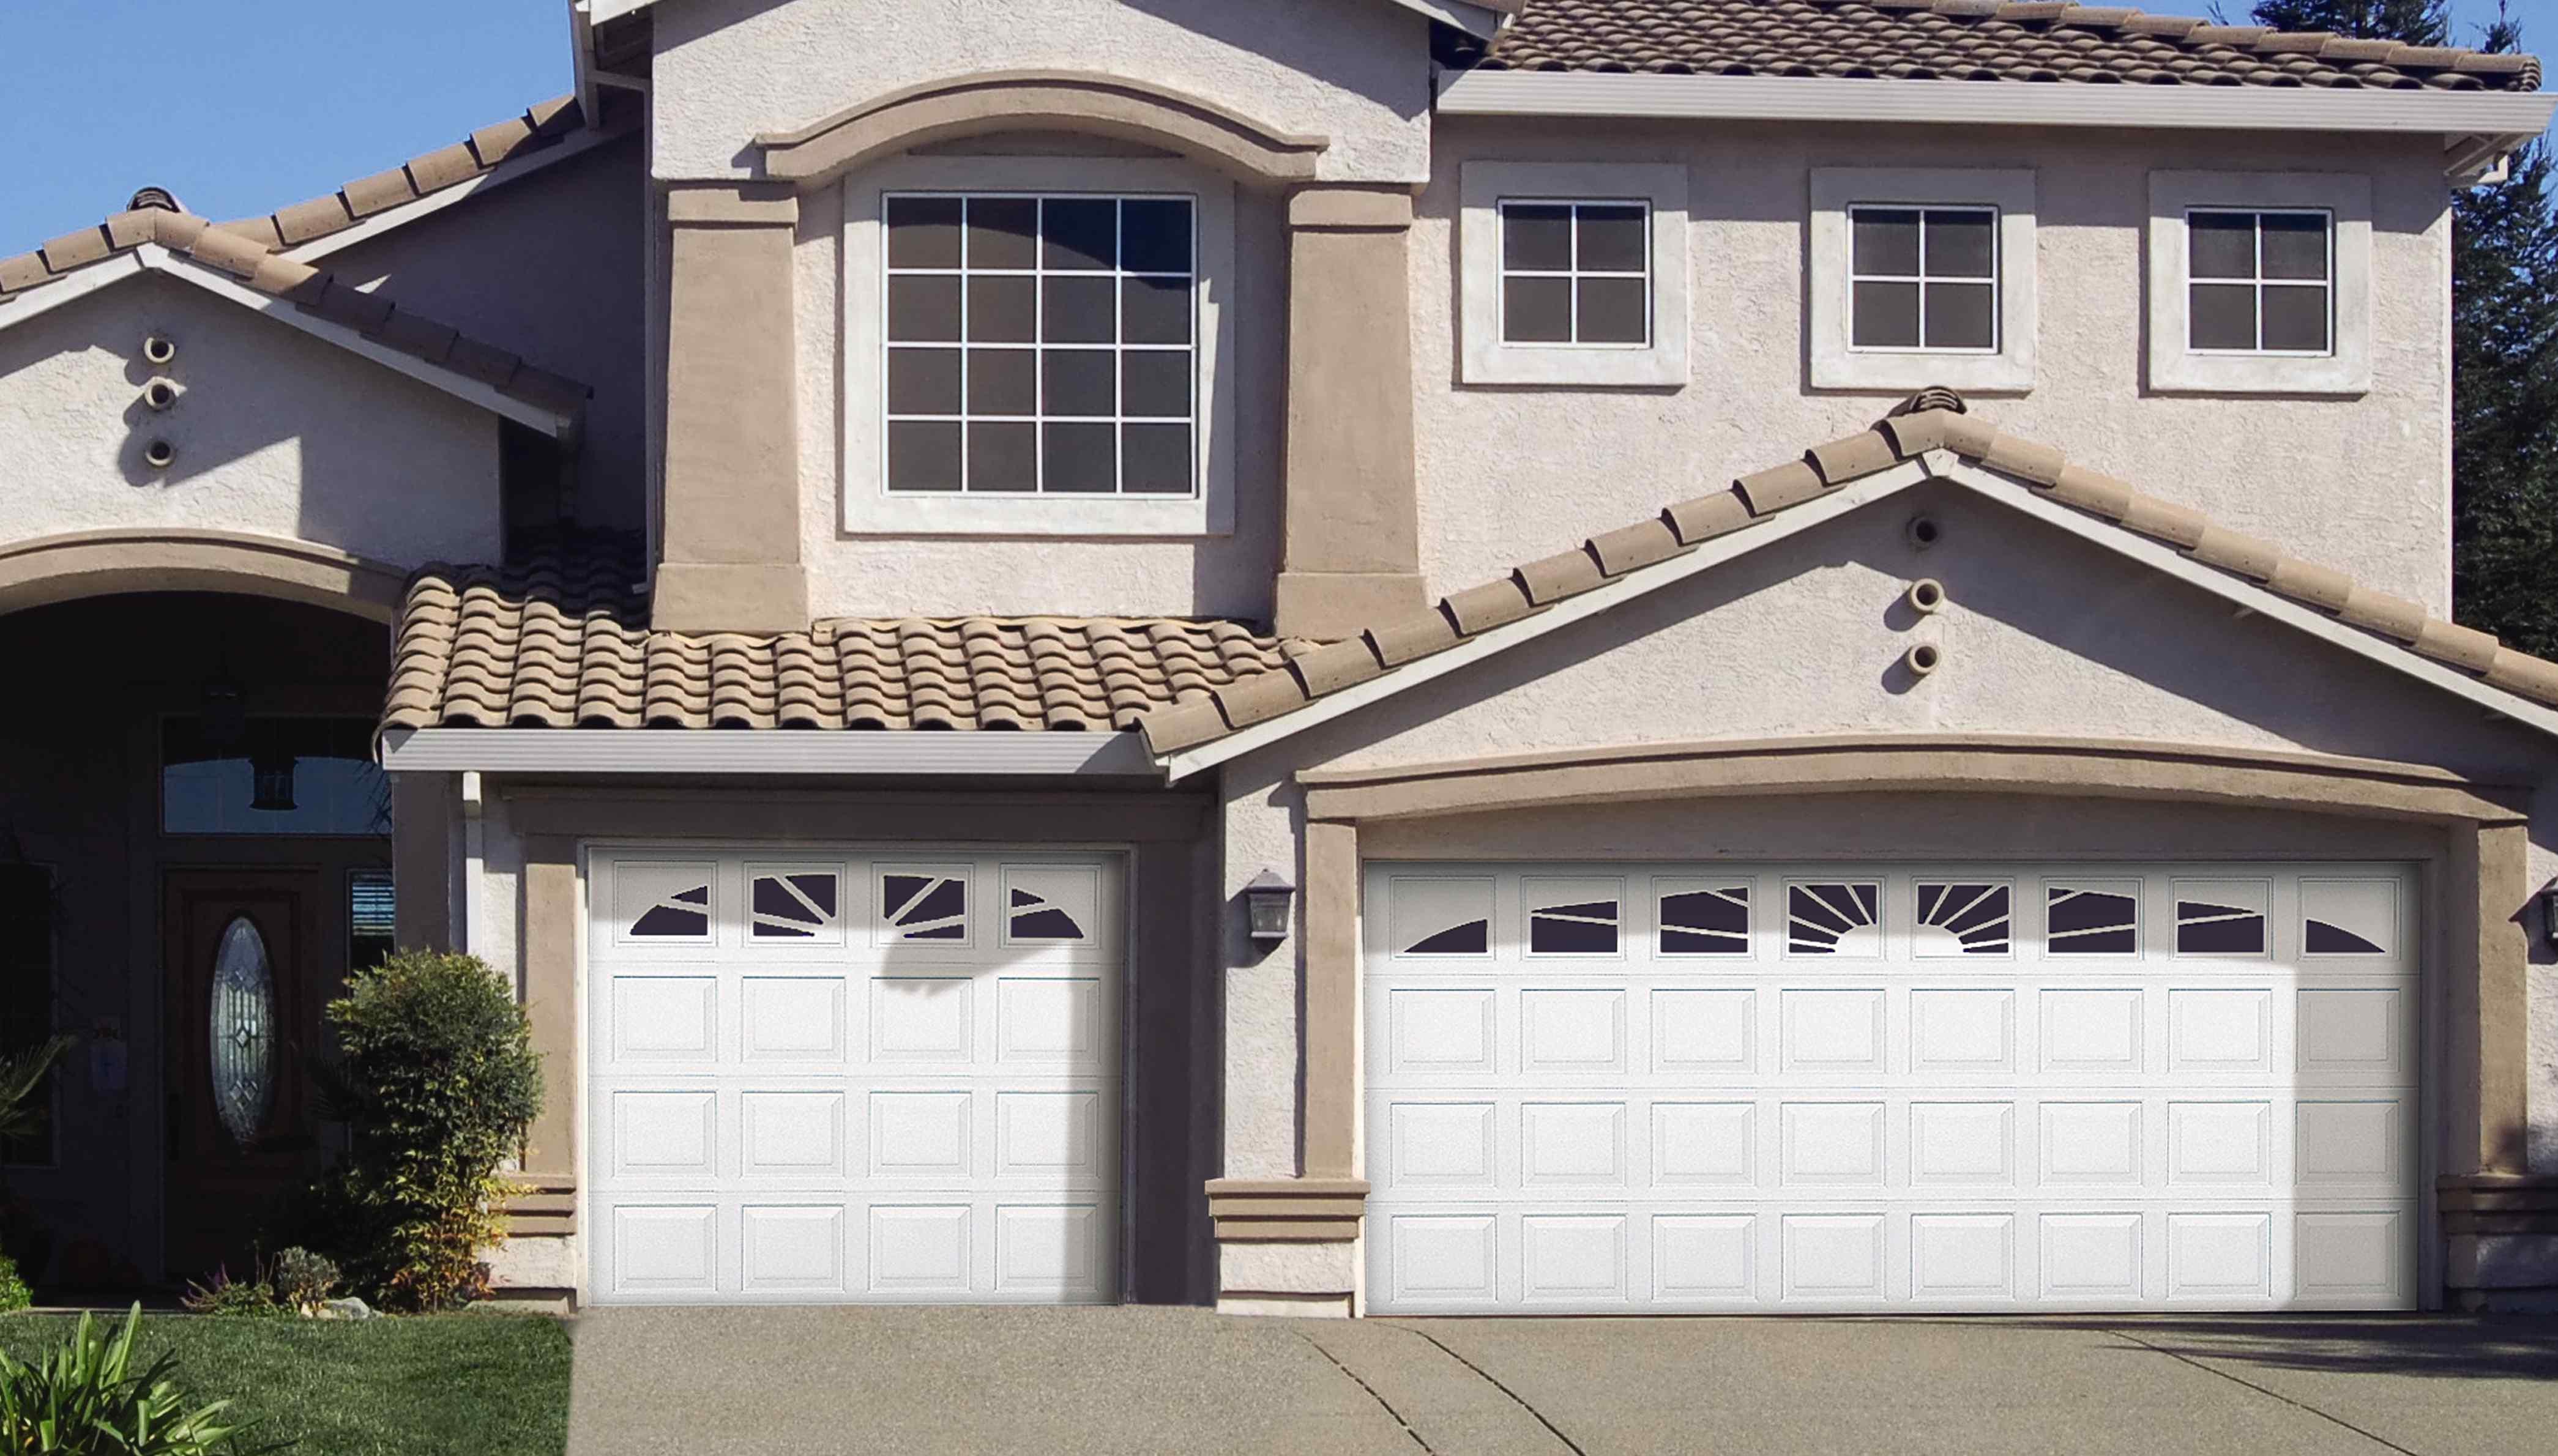 Durafirm Collection durable PVC vinyl exterior garage doors - residential